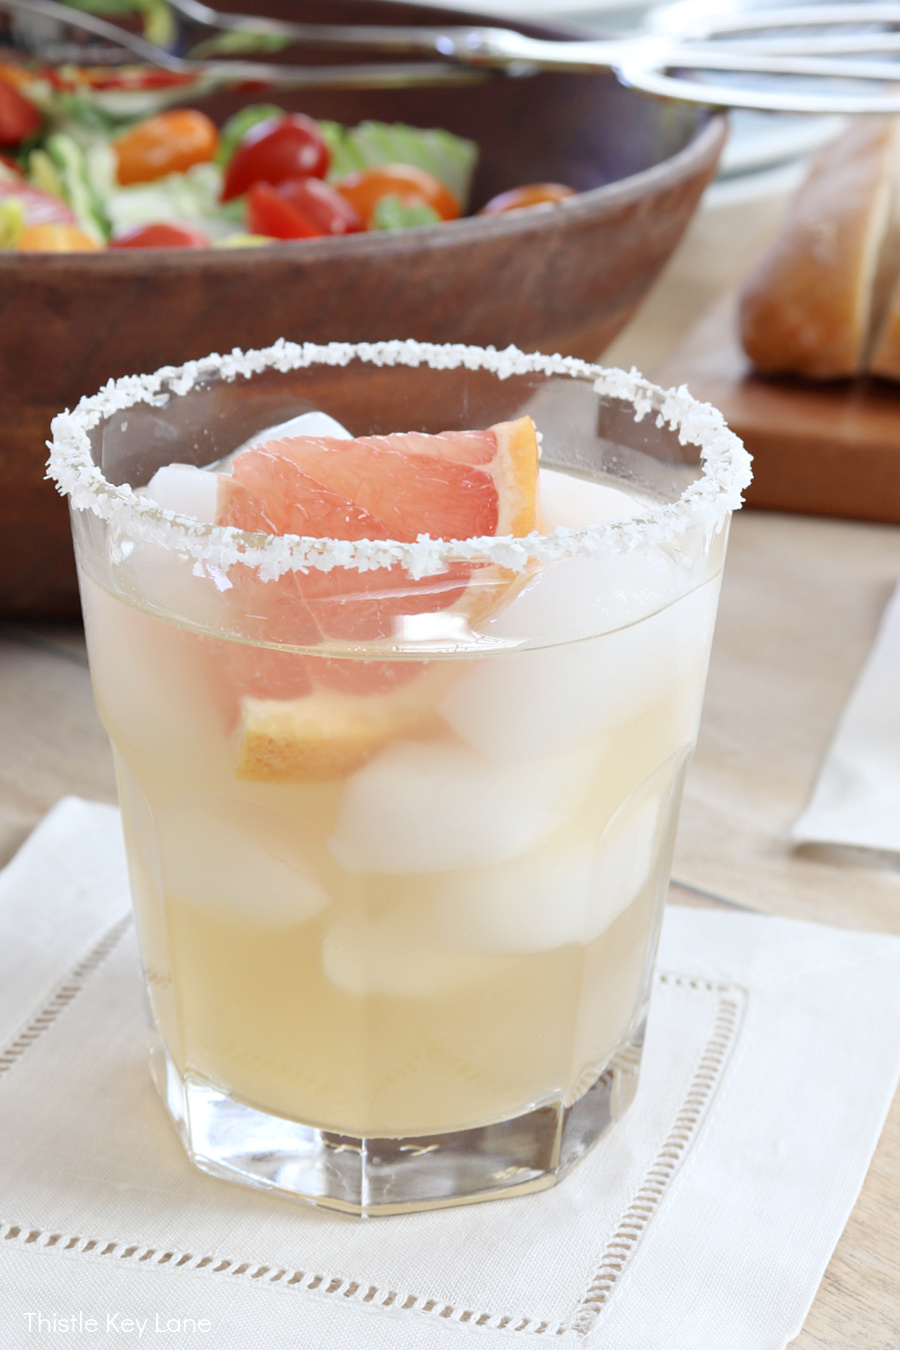 Cocktail with salt rim glass and a slice of grapefruit. Elderflower Grapefruit Margarita Cocktail Recipe.